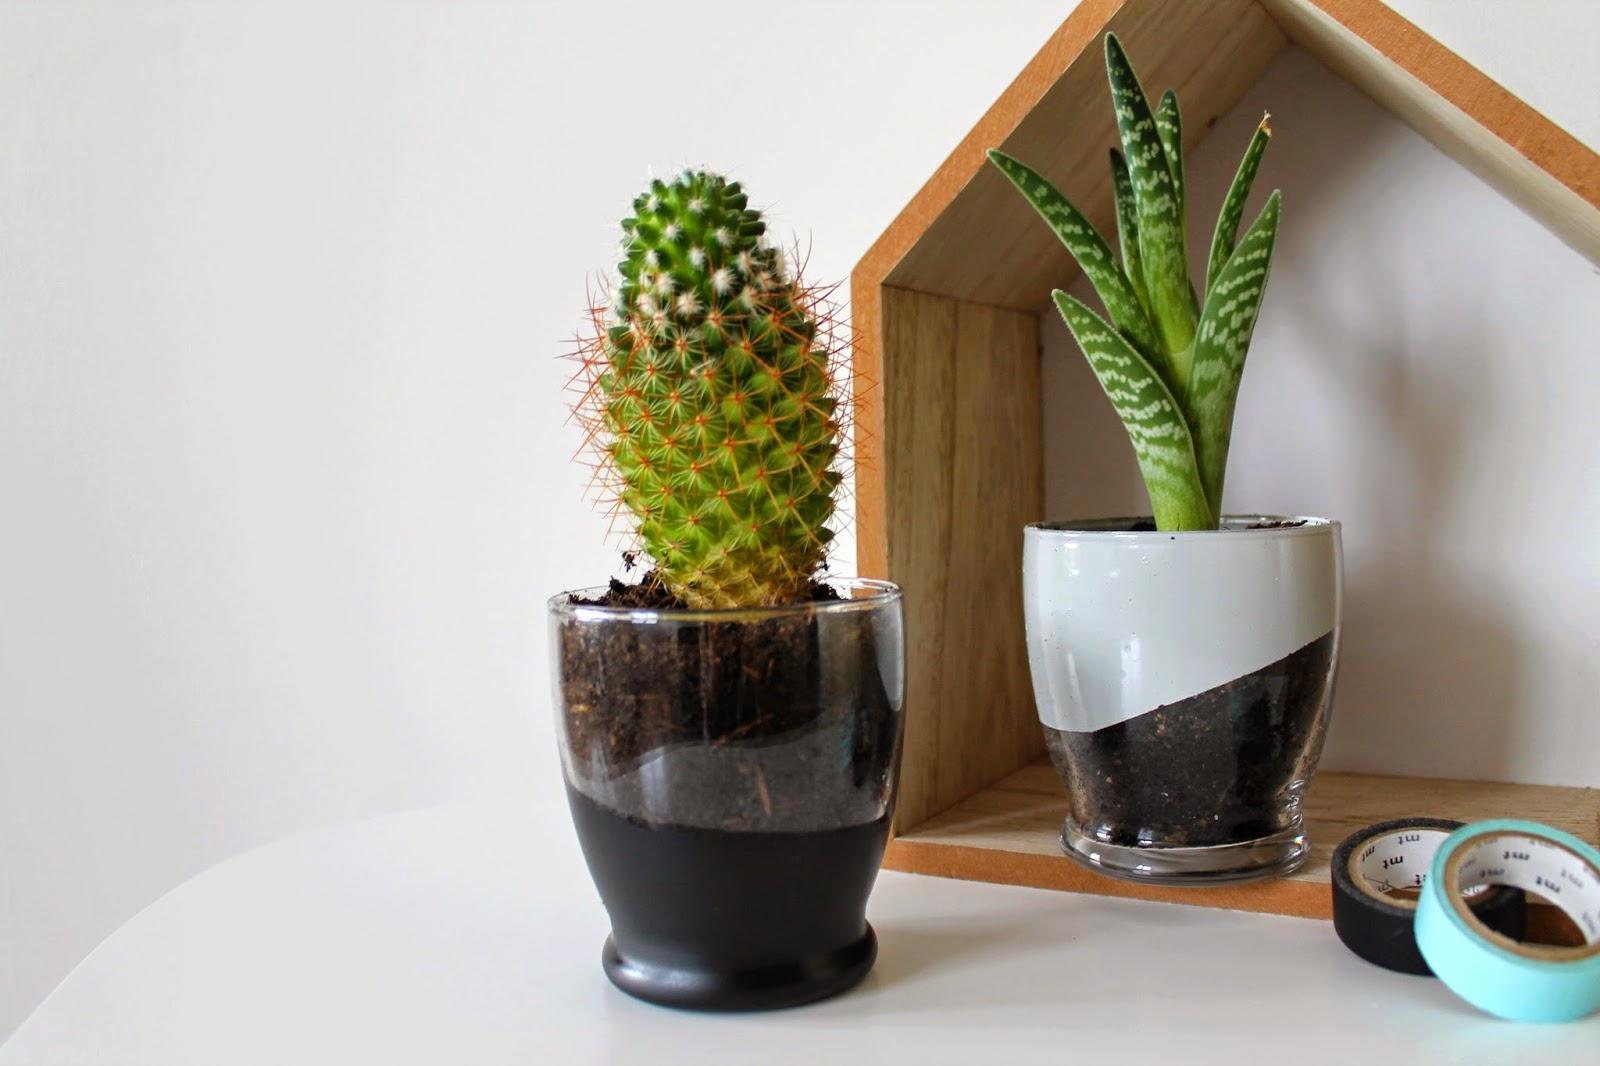 Diy le verre qui devient pot de fleur le bazar d - Diy pot en verre ...